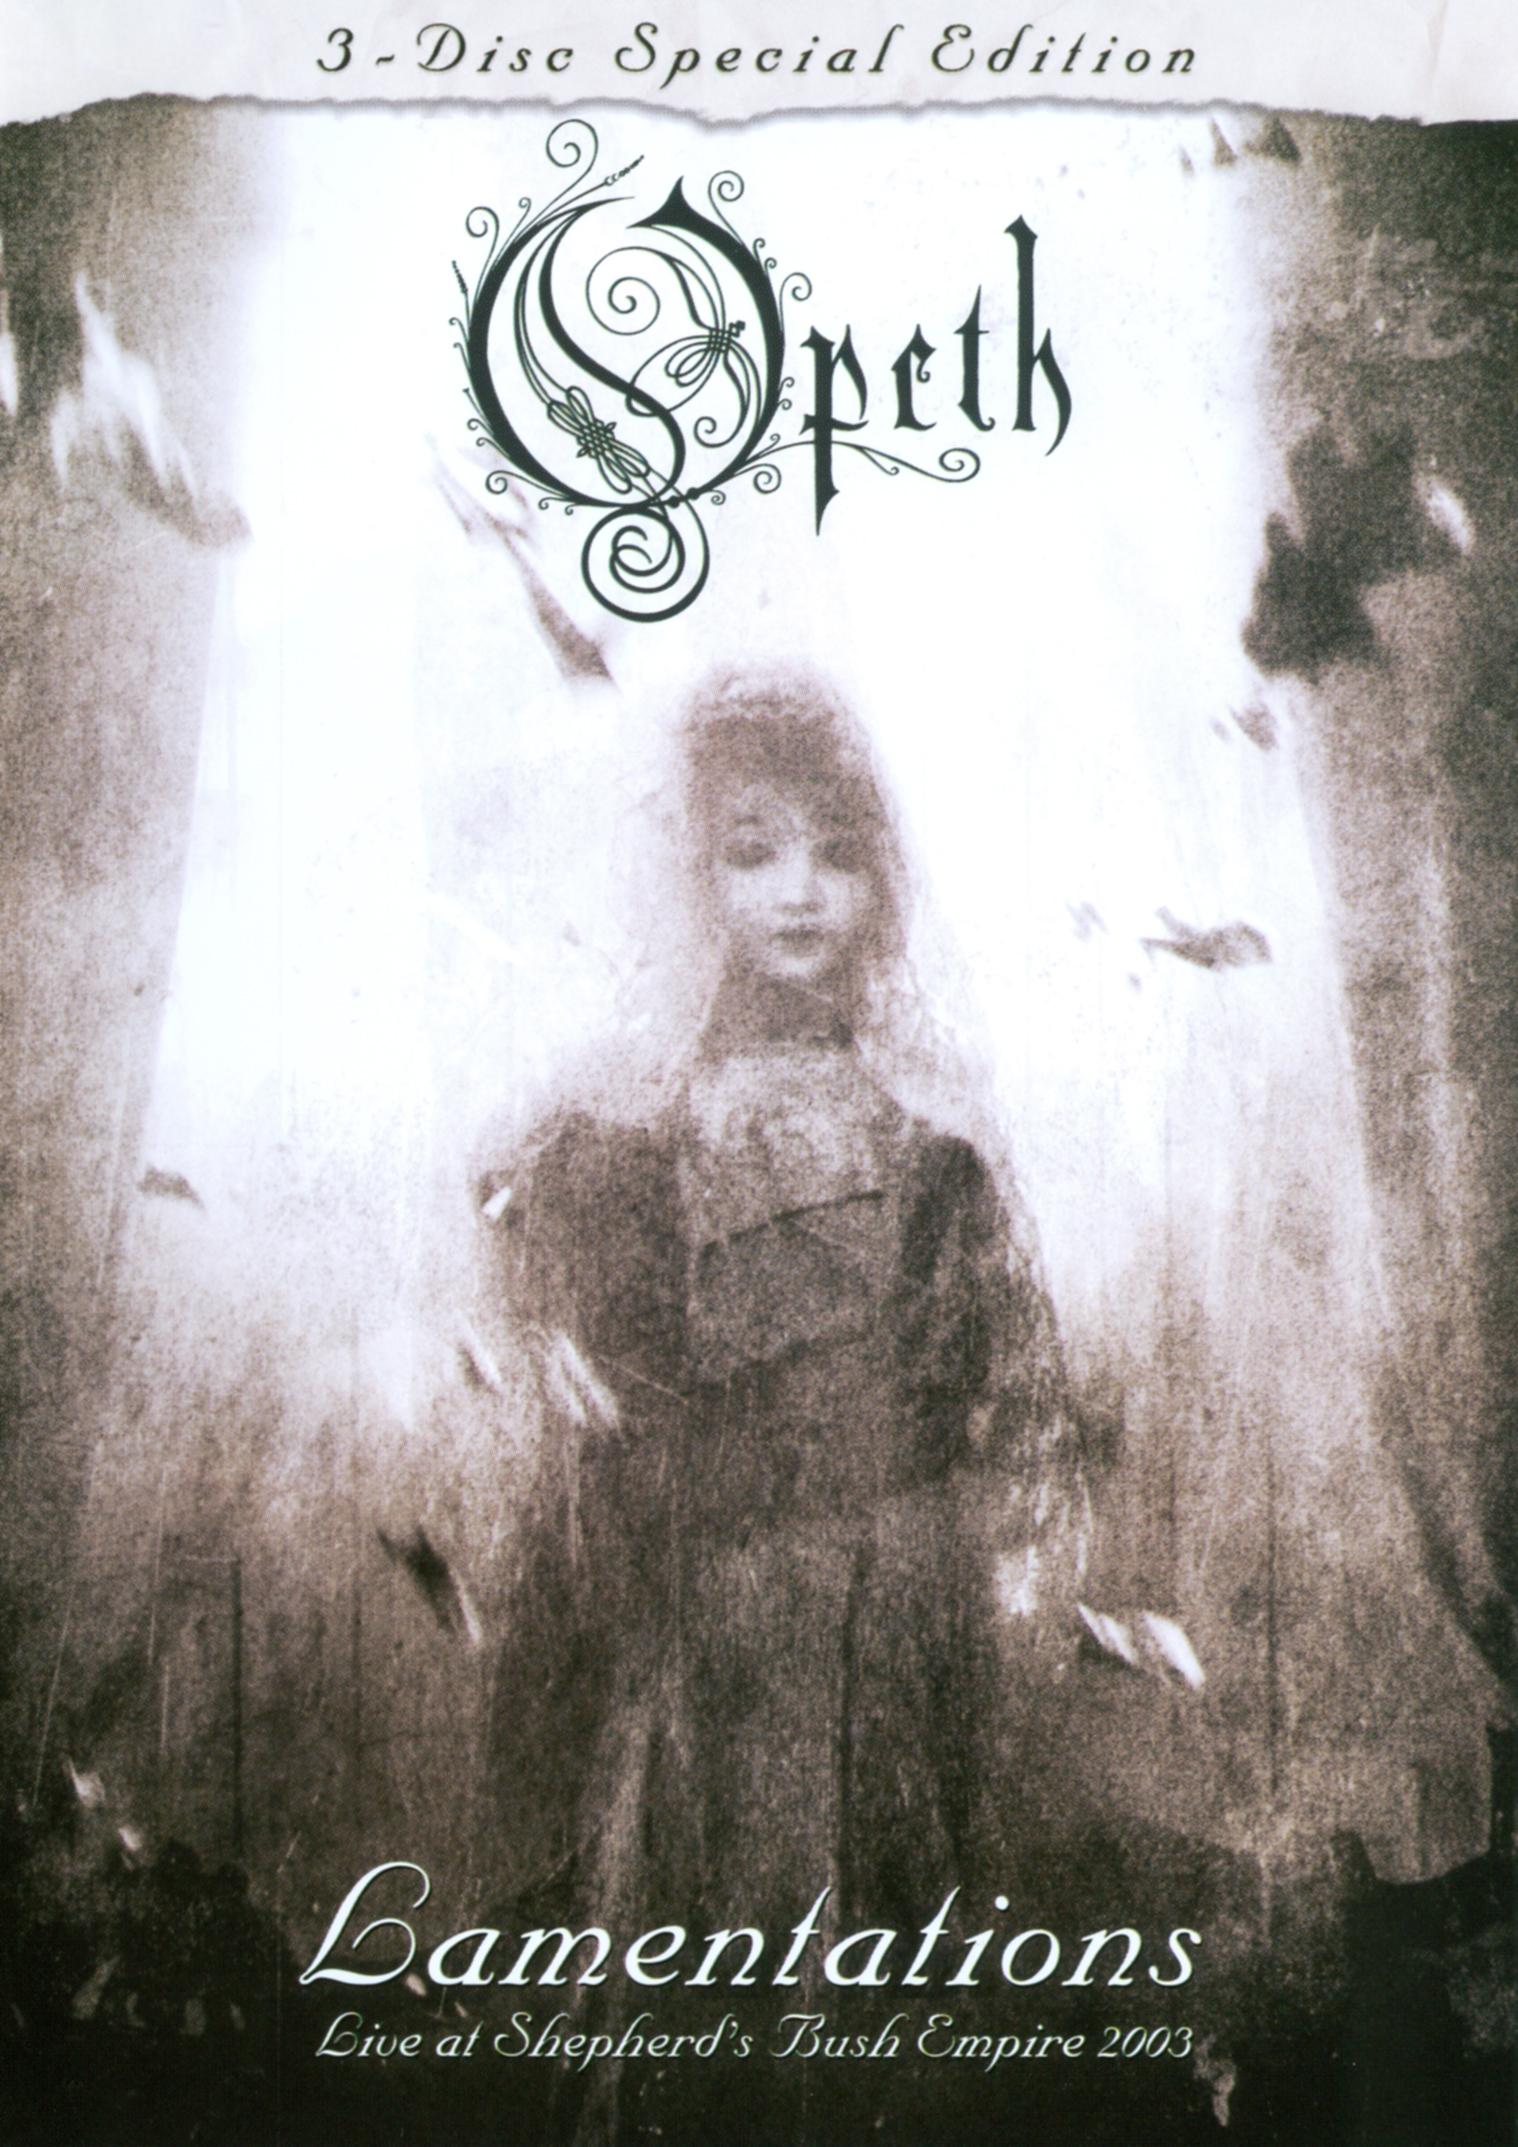 Opeth: Lamentations - Live at Shepherd's Bush Empire